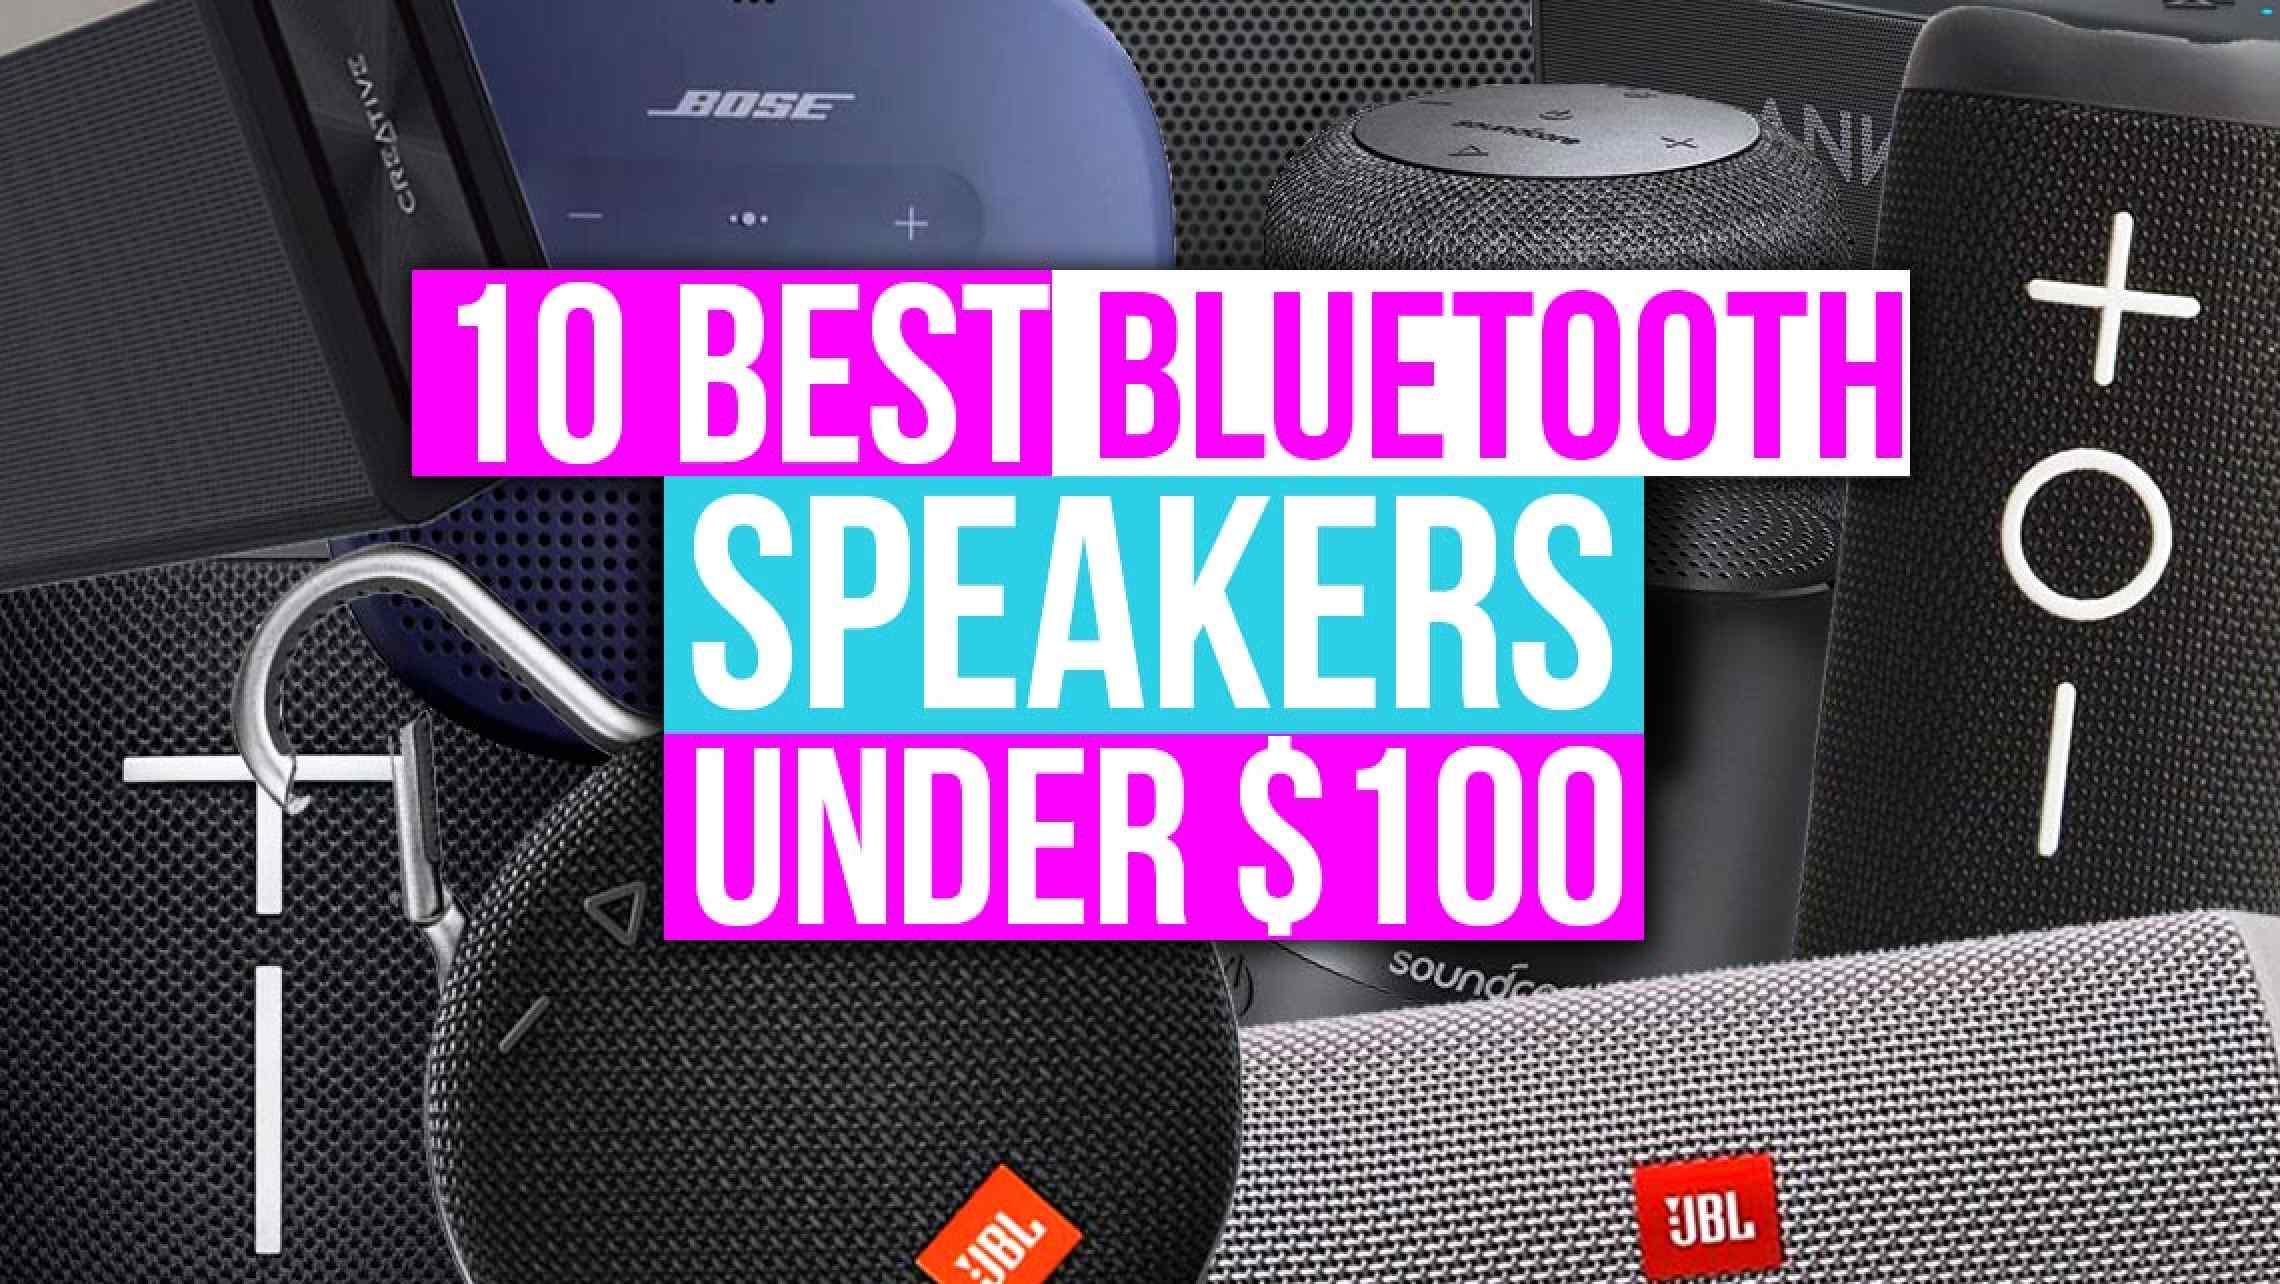 Top 10 Best Bluetooth Speakers Under 100 In 2019 The Ultimate Guide Speakerfanatic